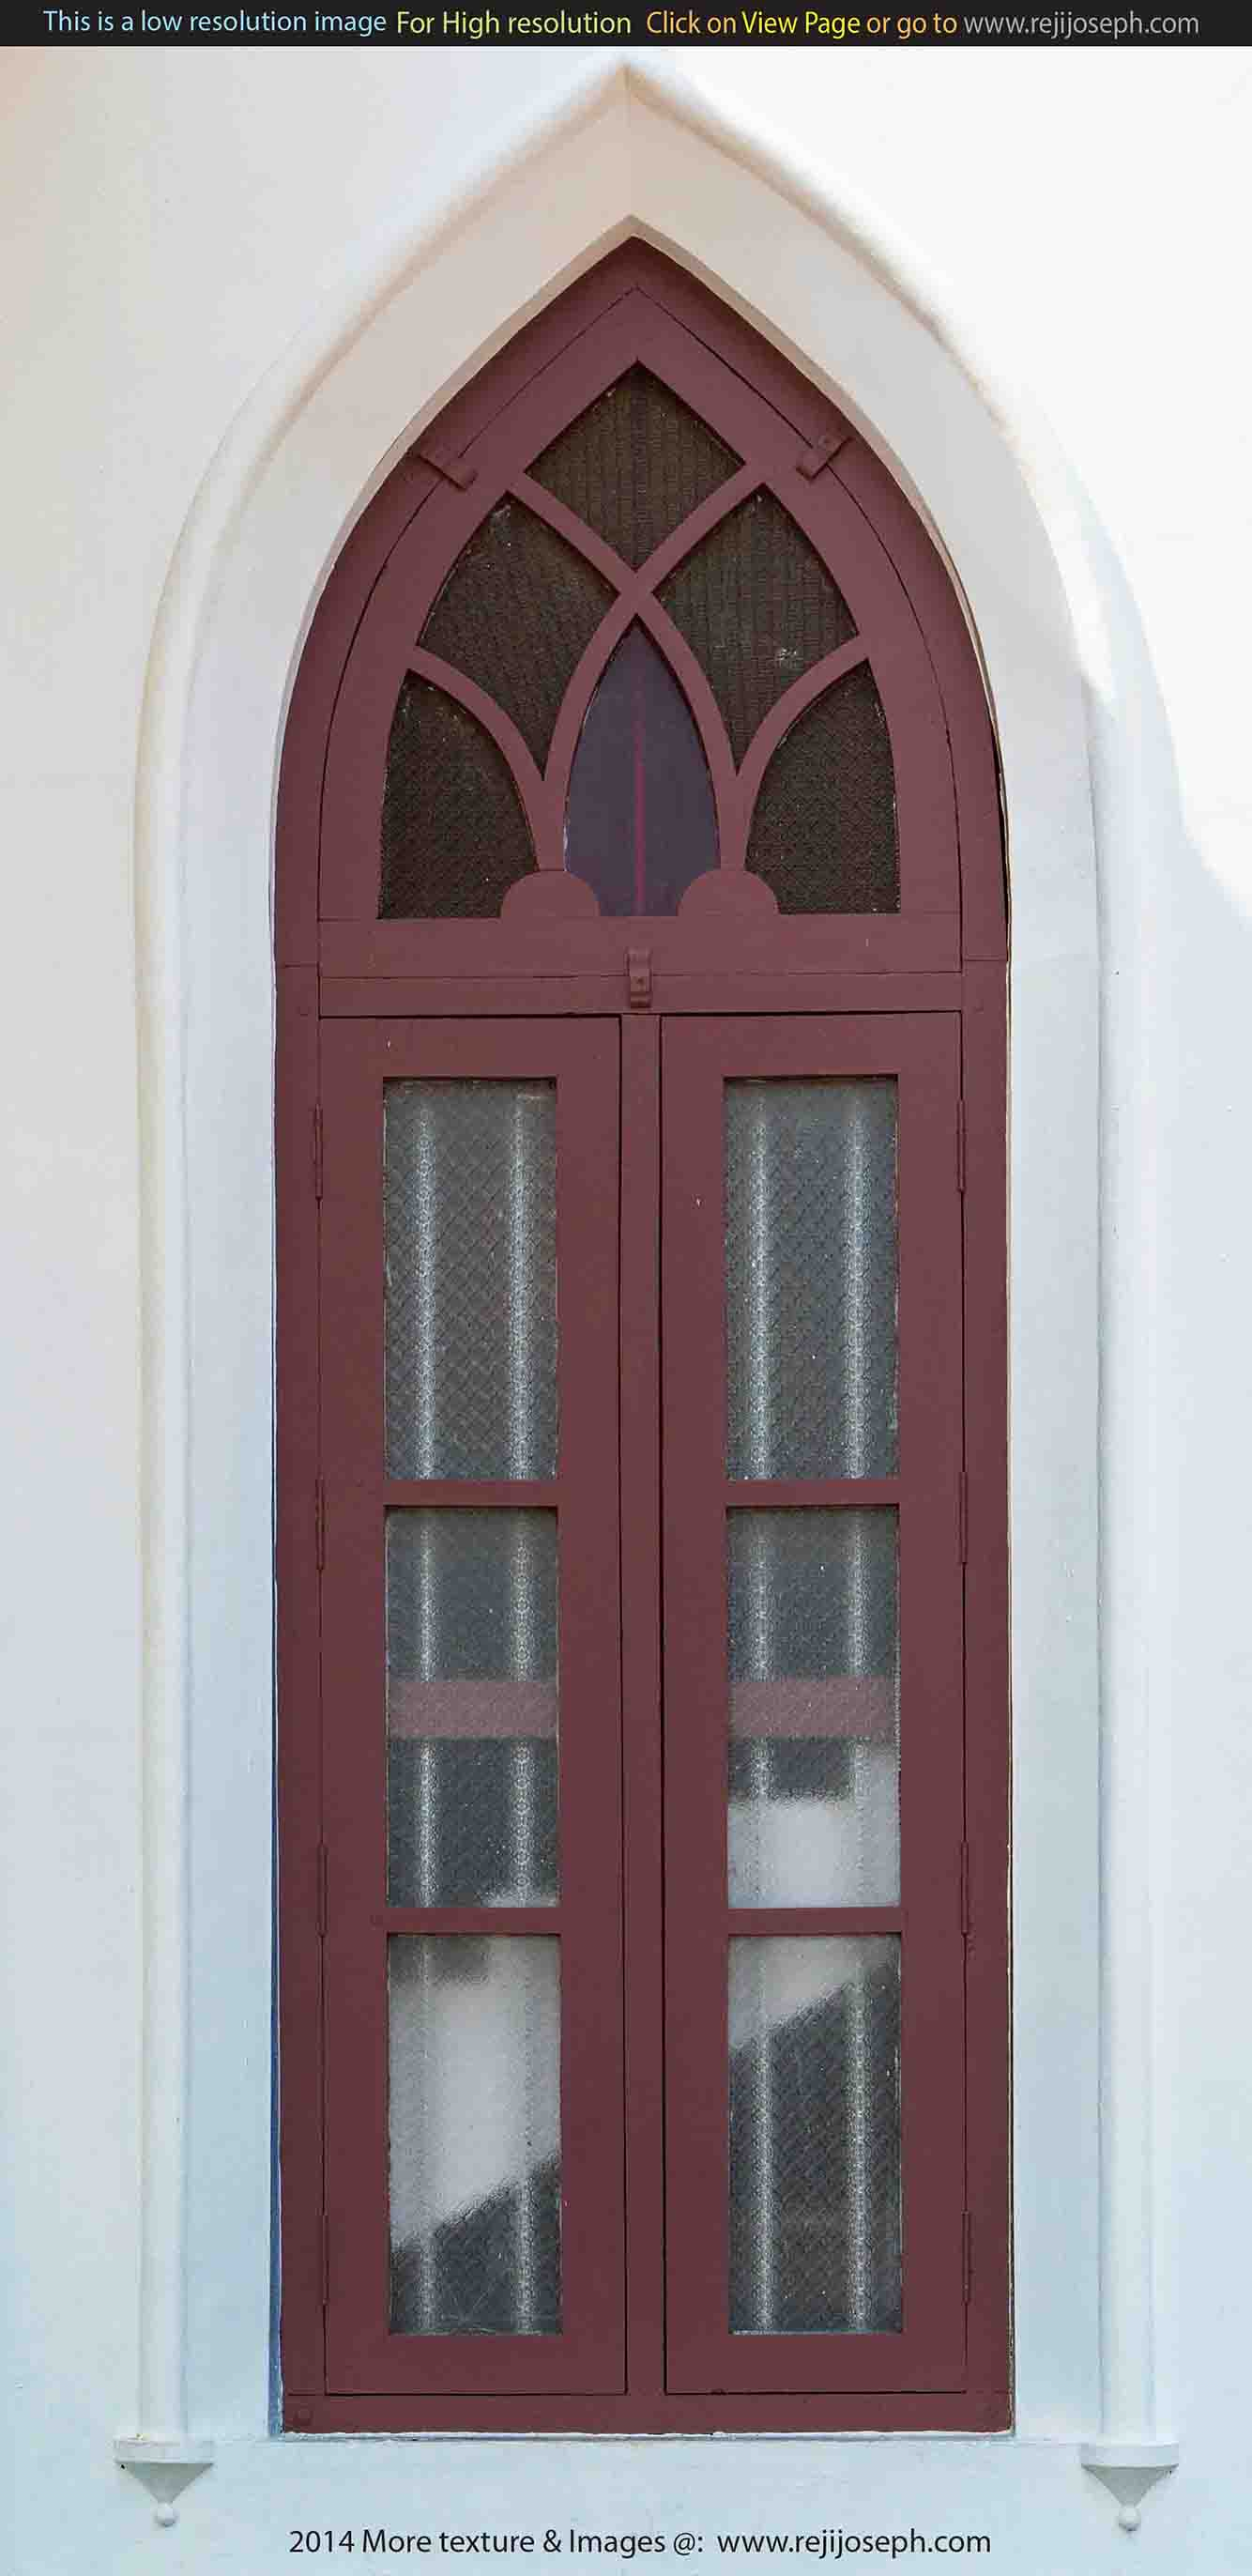 Gothic Window texture 00002